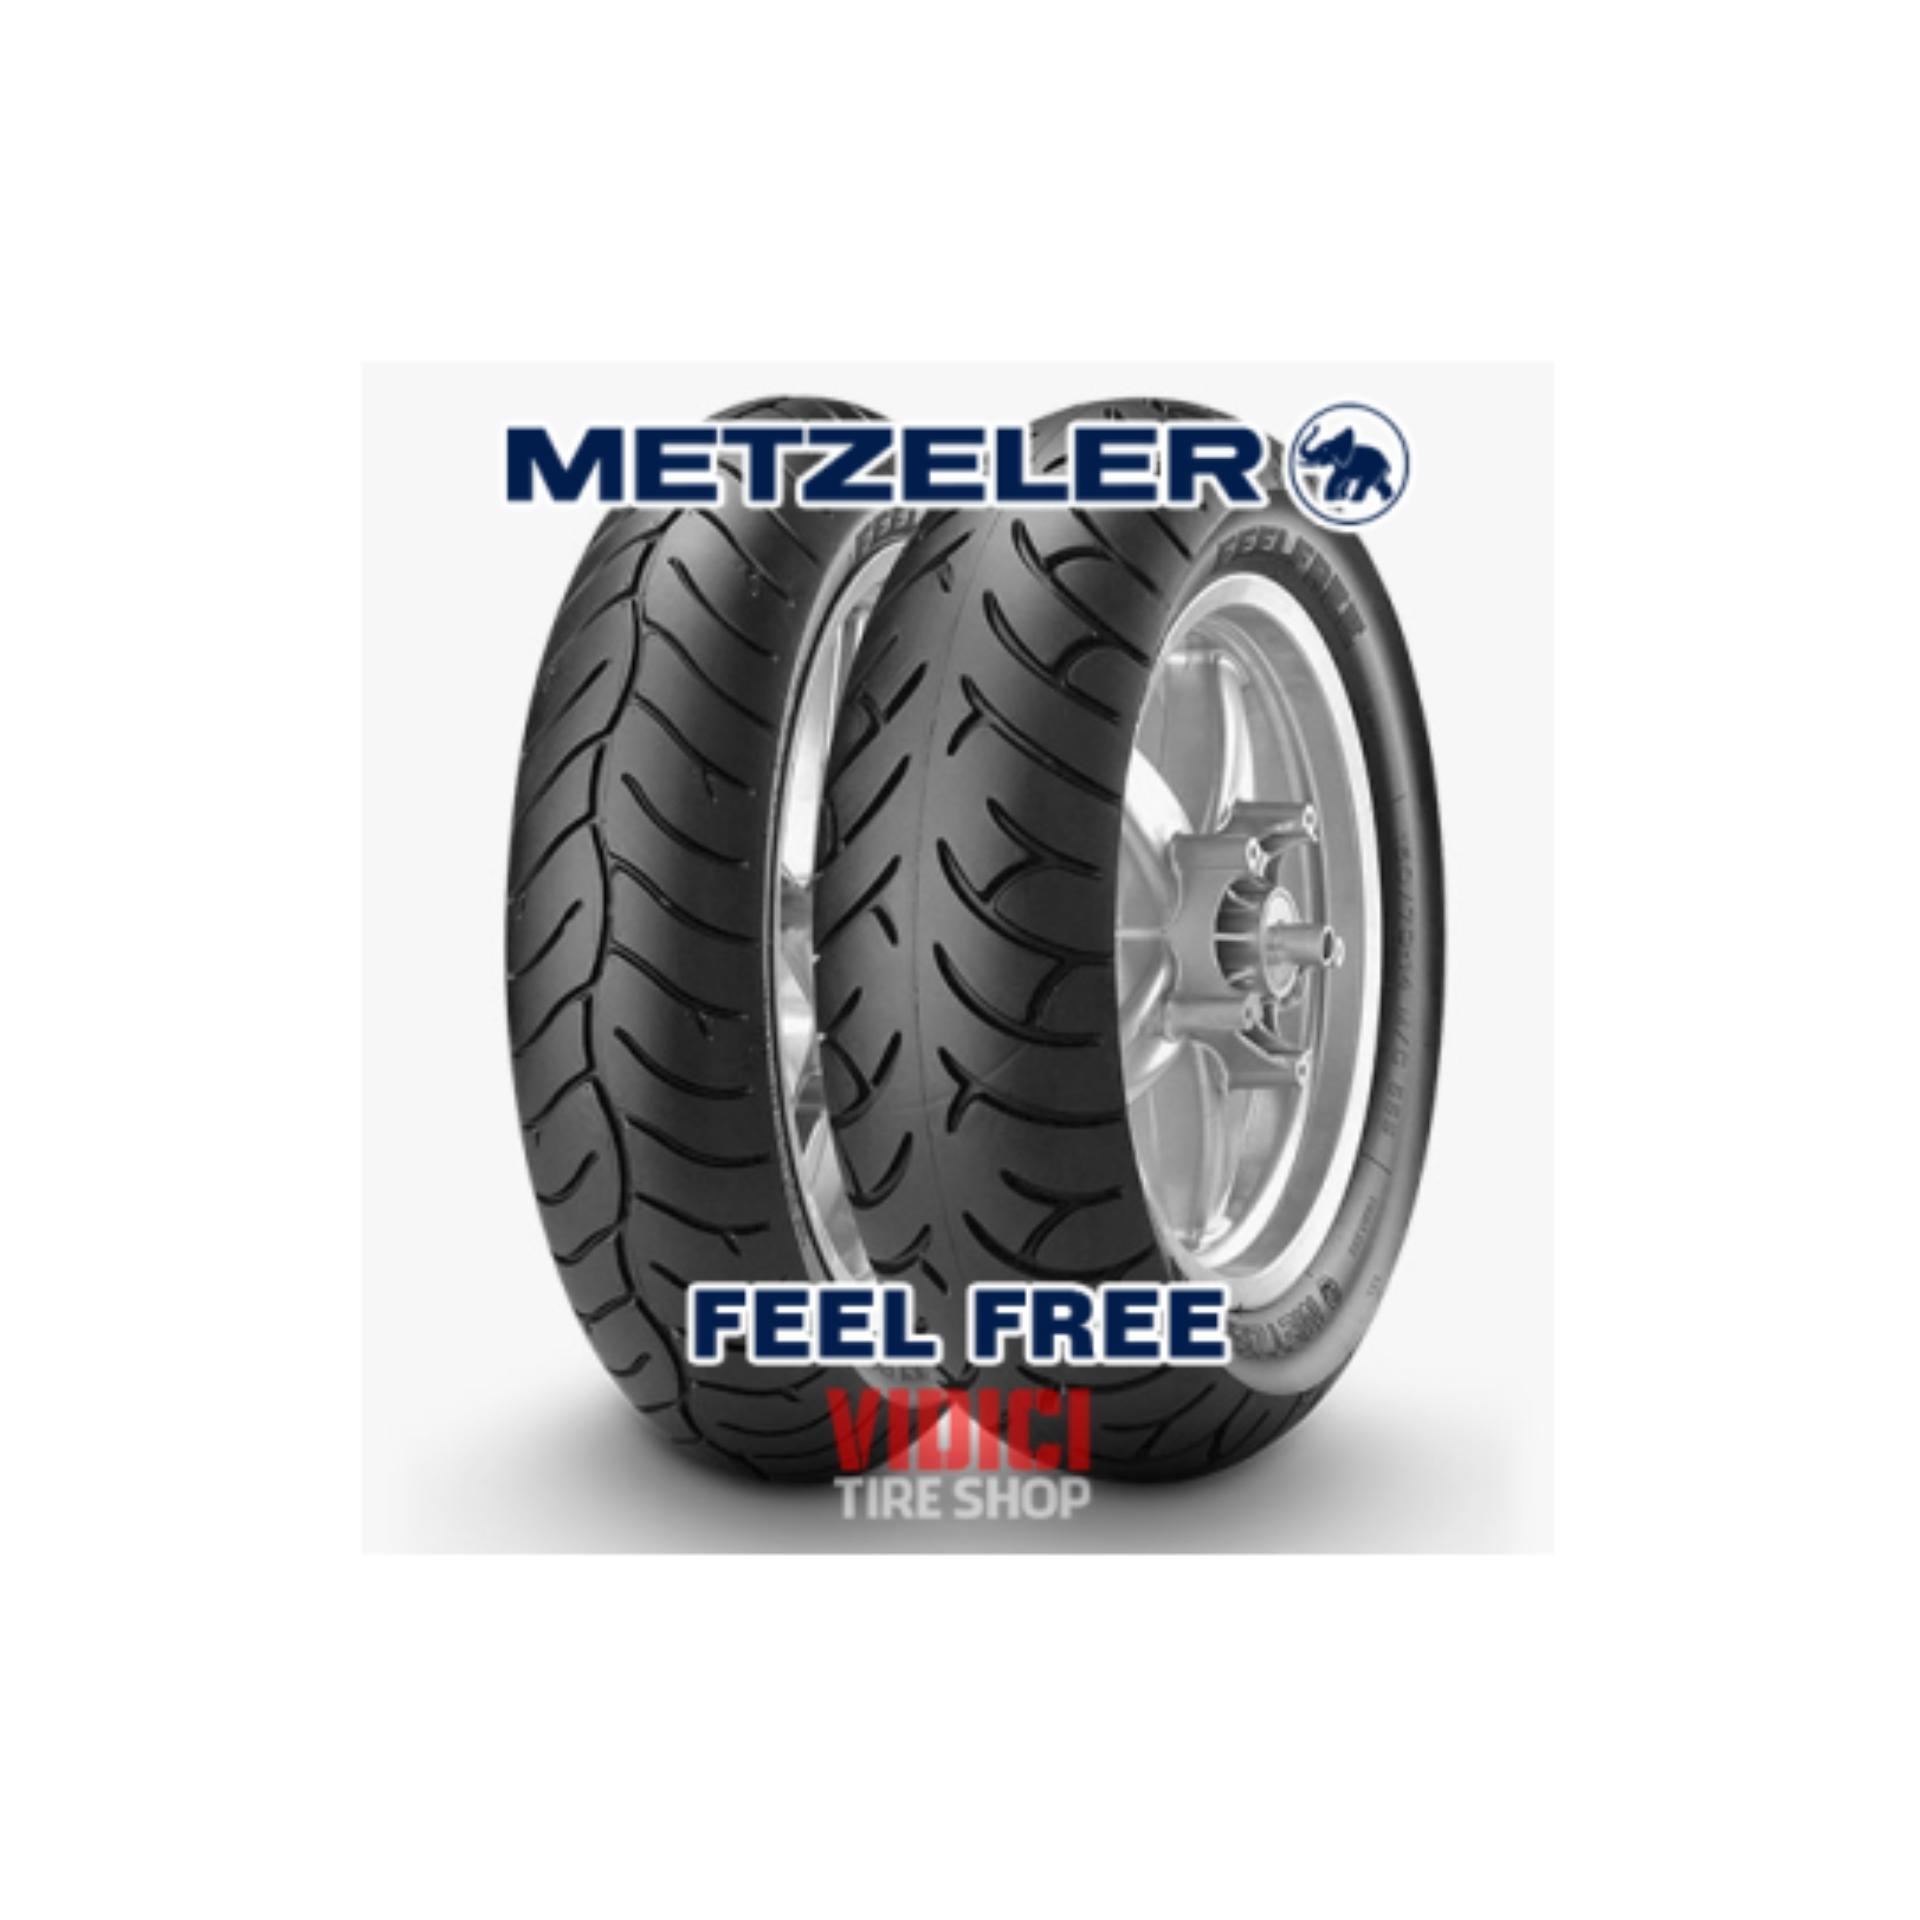 Metzeler FEEL FREE REAR 150/70 - R13 Ban Motor Yamaha N .